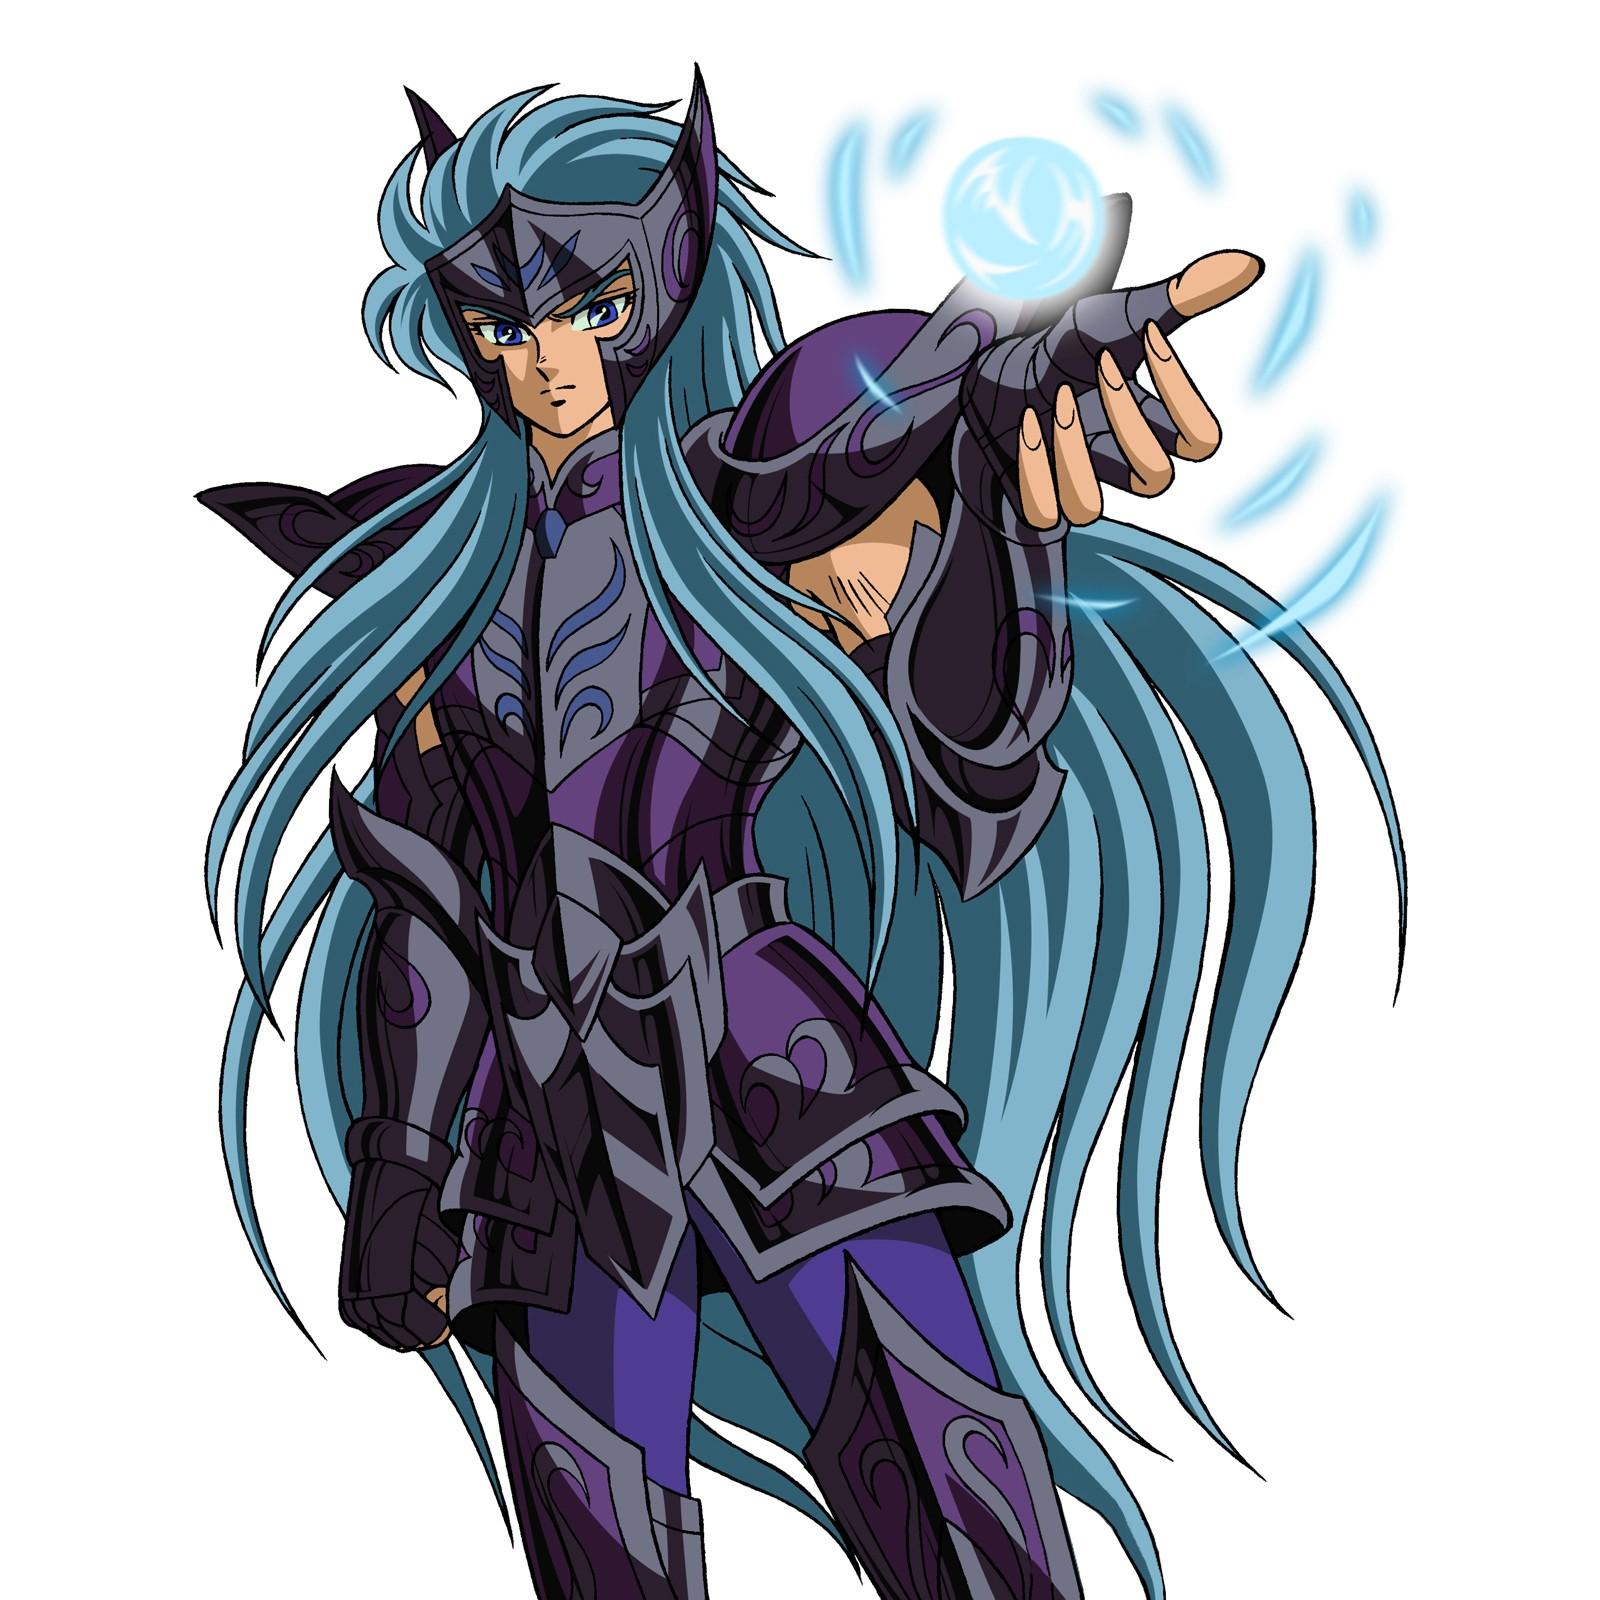 Aquarius Camus Saint Seiya Image 37303 Zerochan